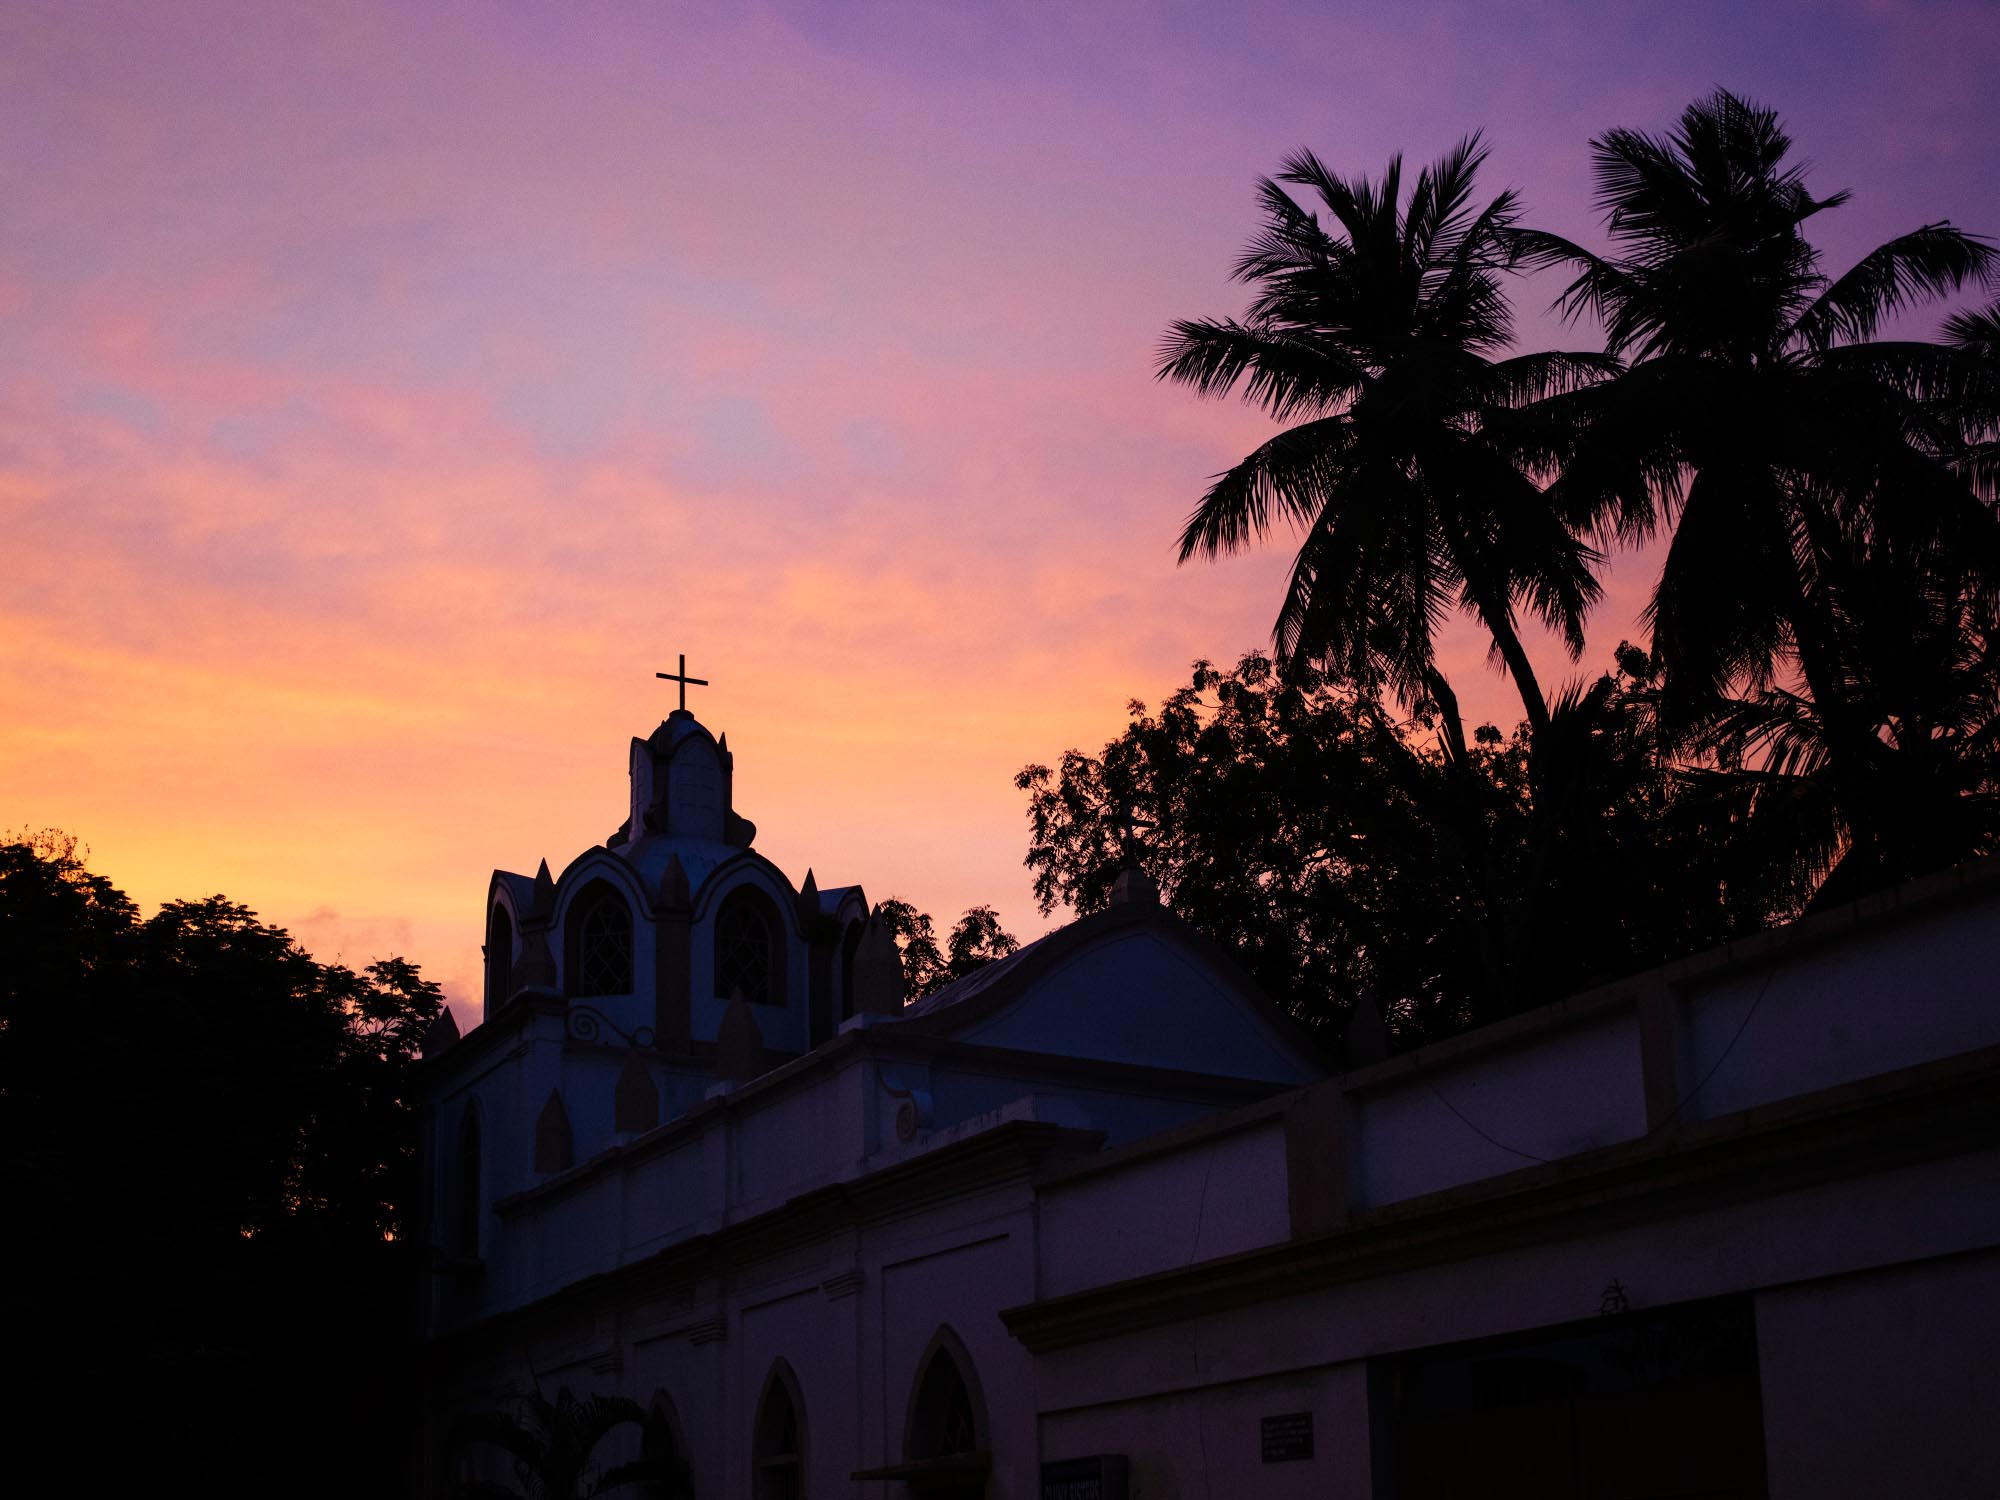 old-photos-postcards-puducherry-sunset.jpg